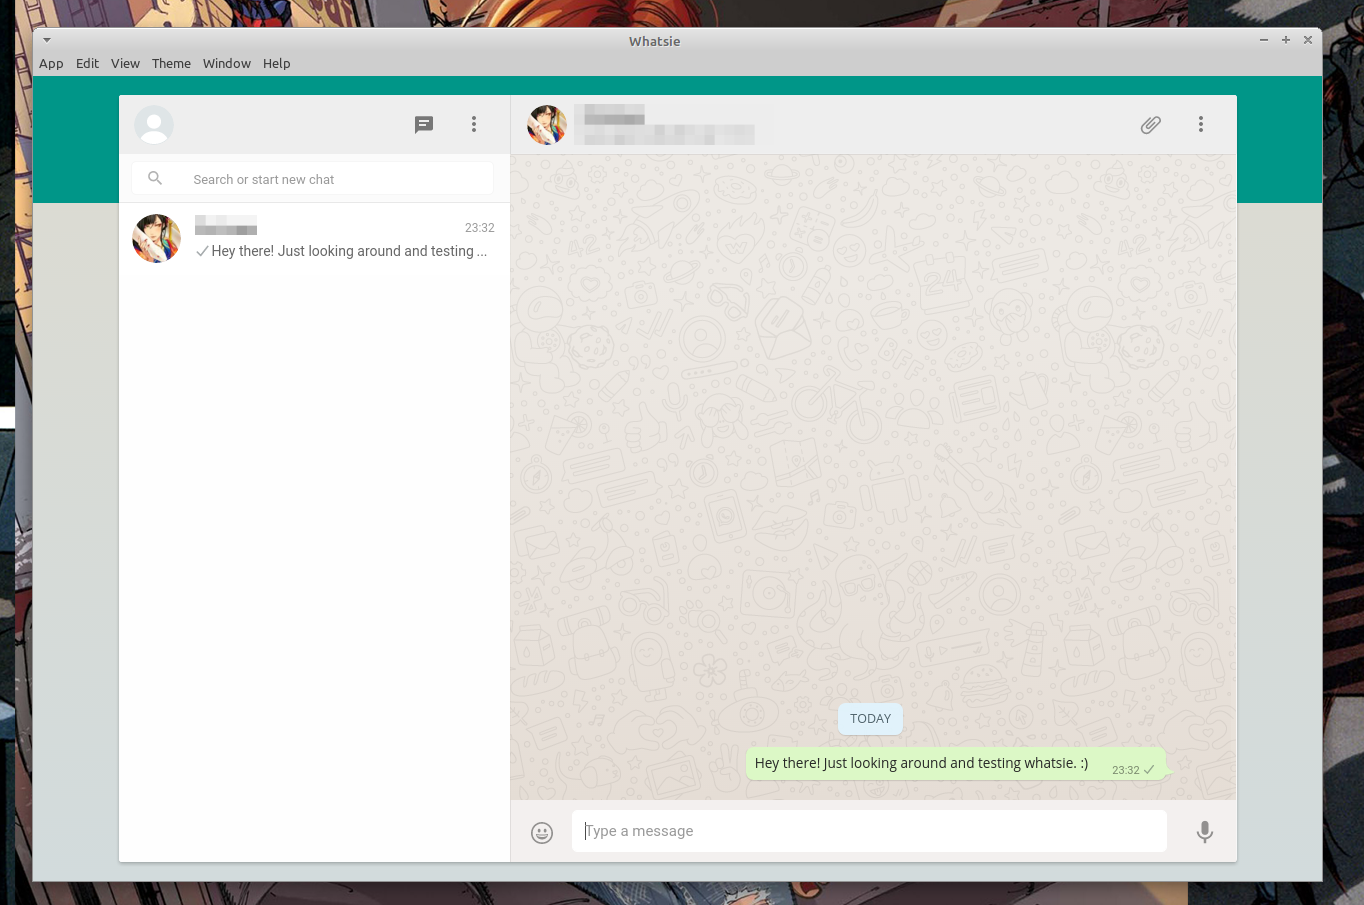 Whatsie - неофициальный десктопный клиент Whatsapp Messenger